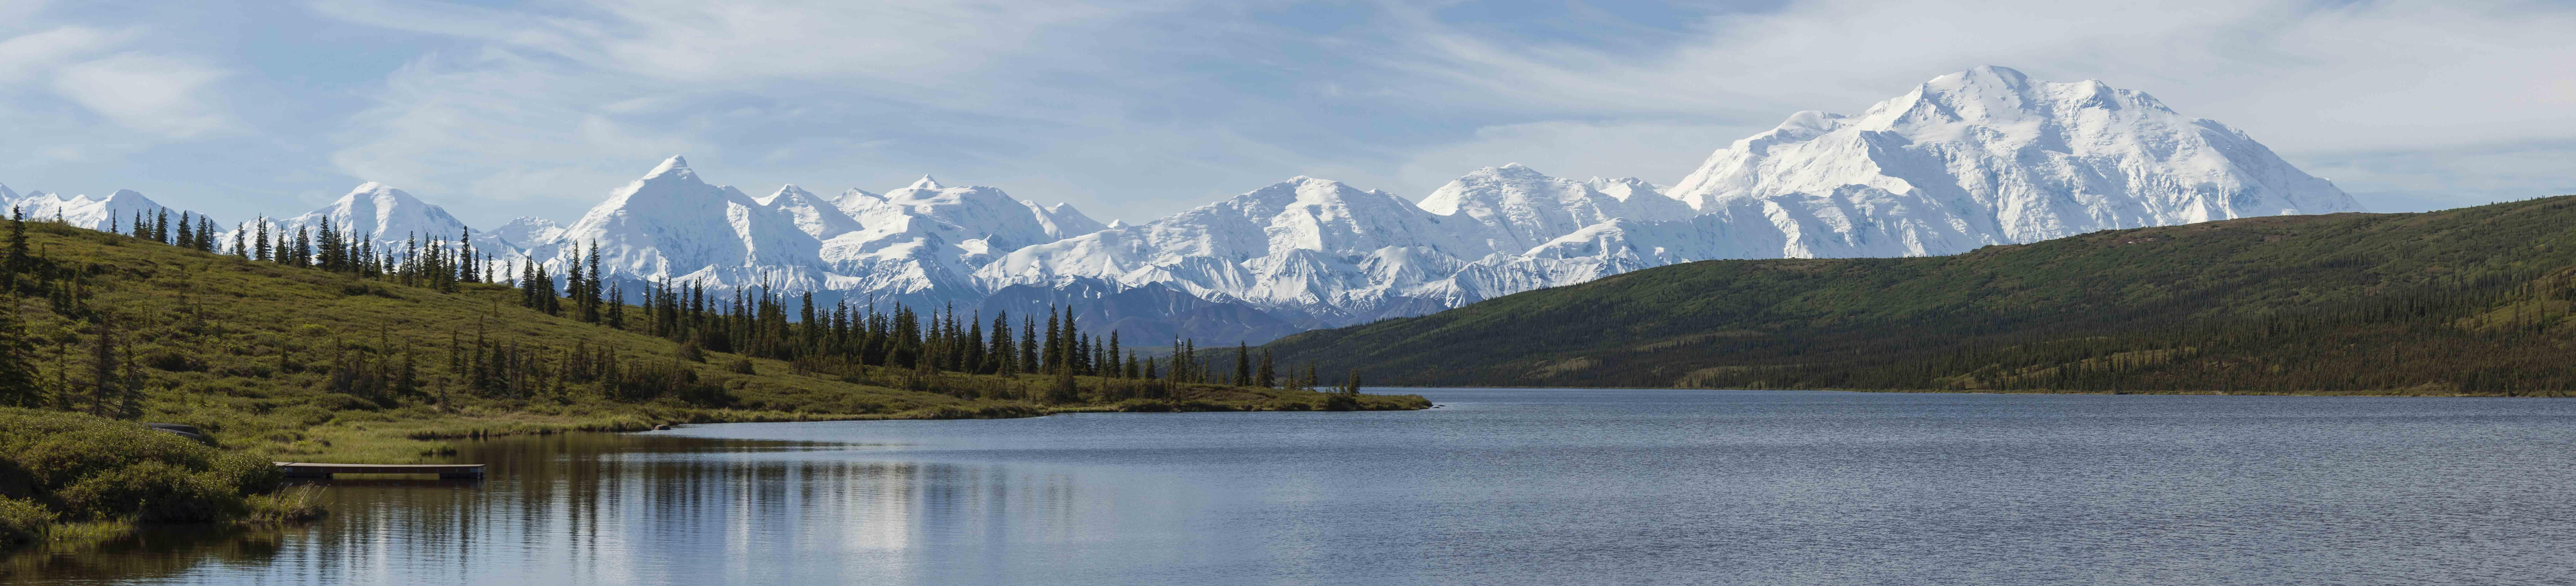 Alaska : explorer le nord des Etats-Unis